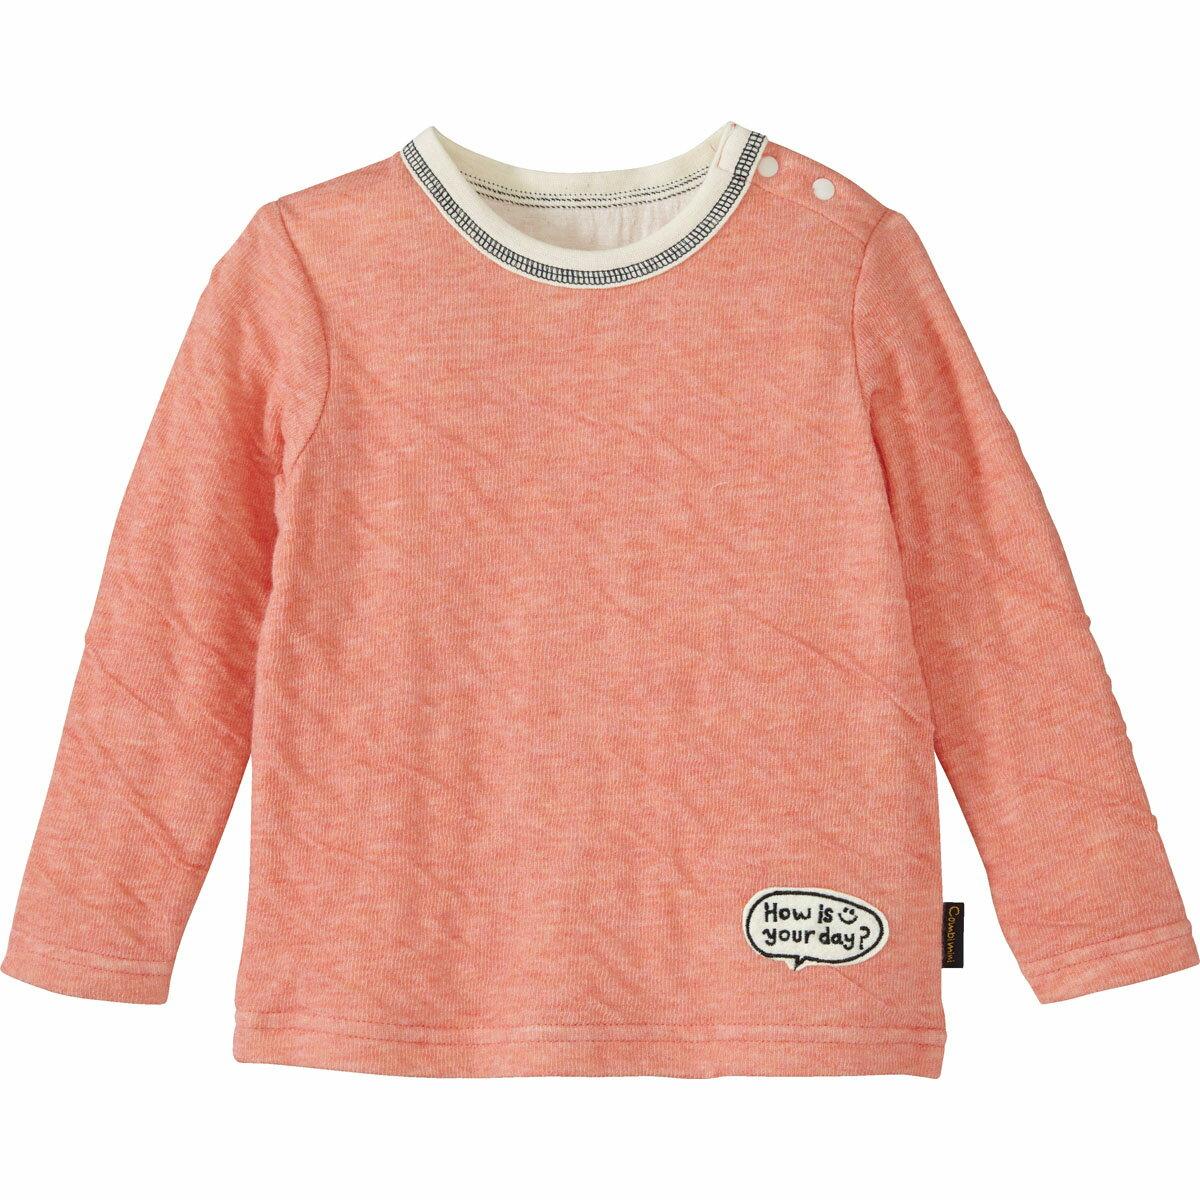 【40%OFF】ふわふわガーゼニットTシャツ{男の子 女の子}《コンビミニ》ギフト ベビー服 子供服 Combi miniふわふわガーゼニットTシャツ